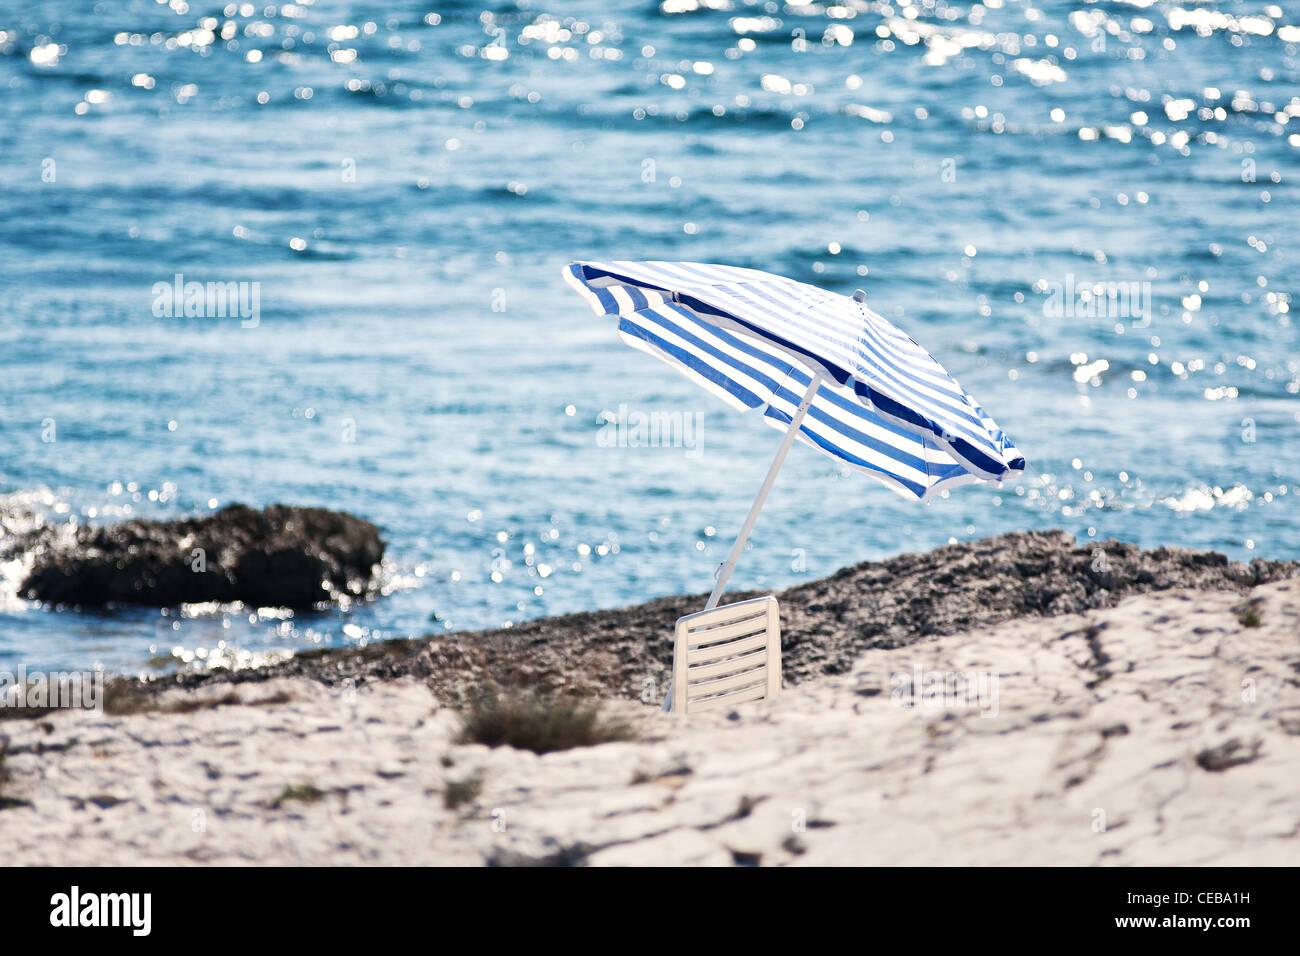 the stony beach with parasol - Kamenjak near Premantura, 13 km by Pula - Stock Image